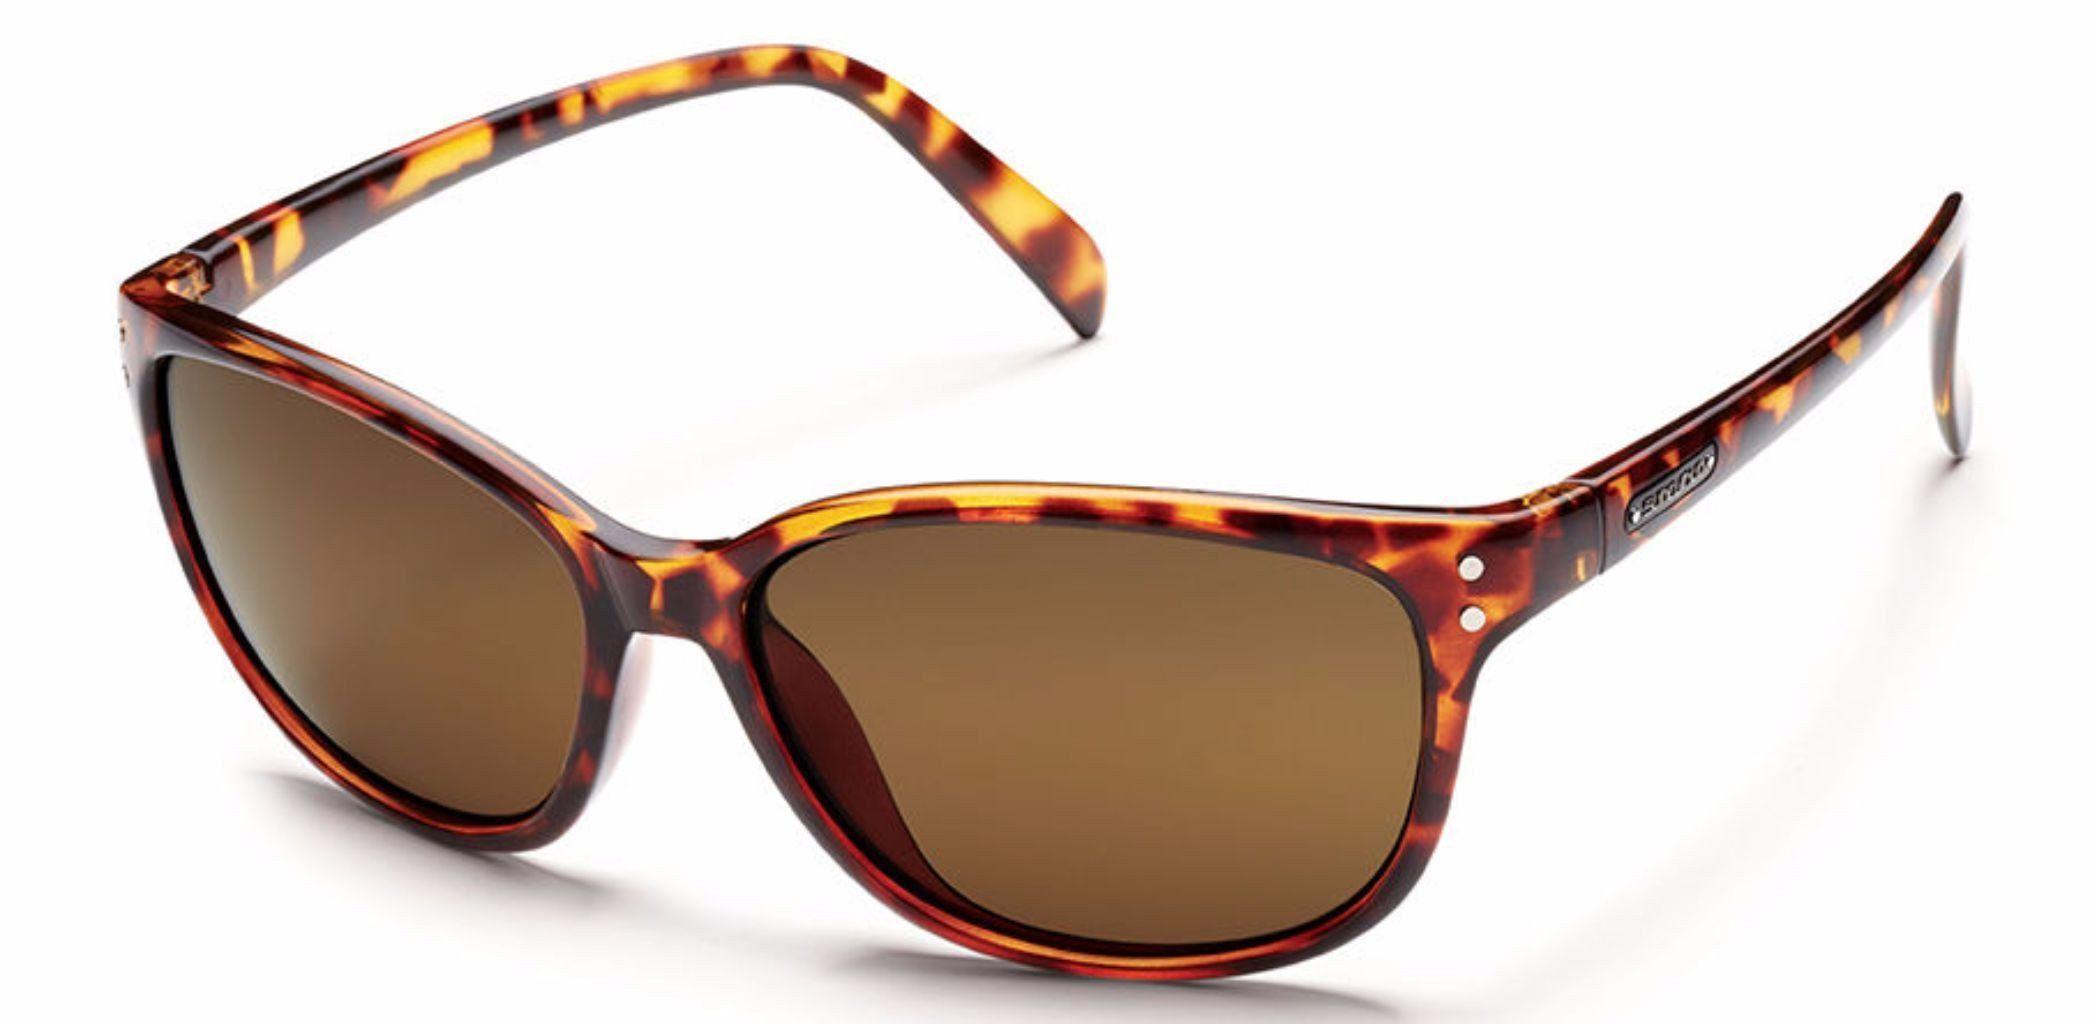 Suncloud Flutter SFEPPBRTT Sunglasses Sunglasses for